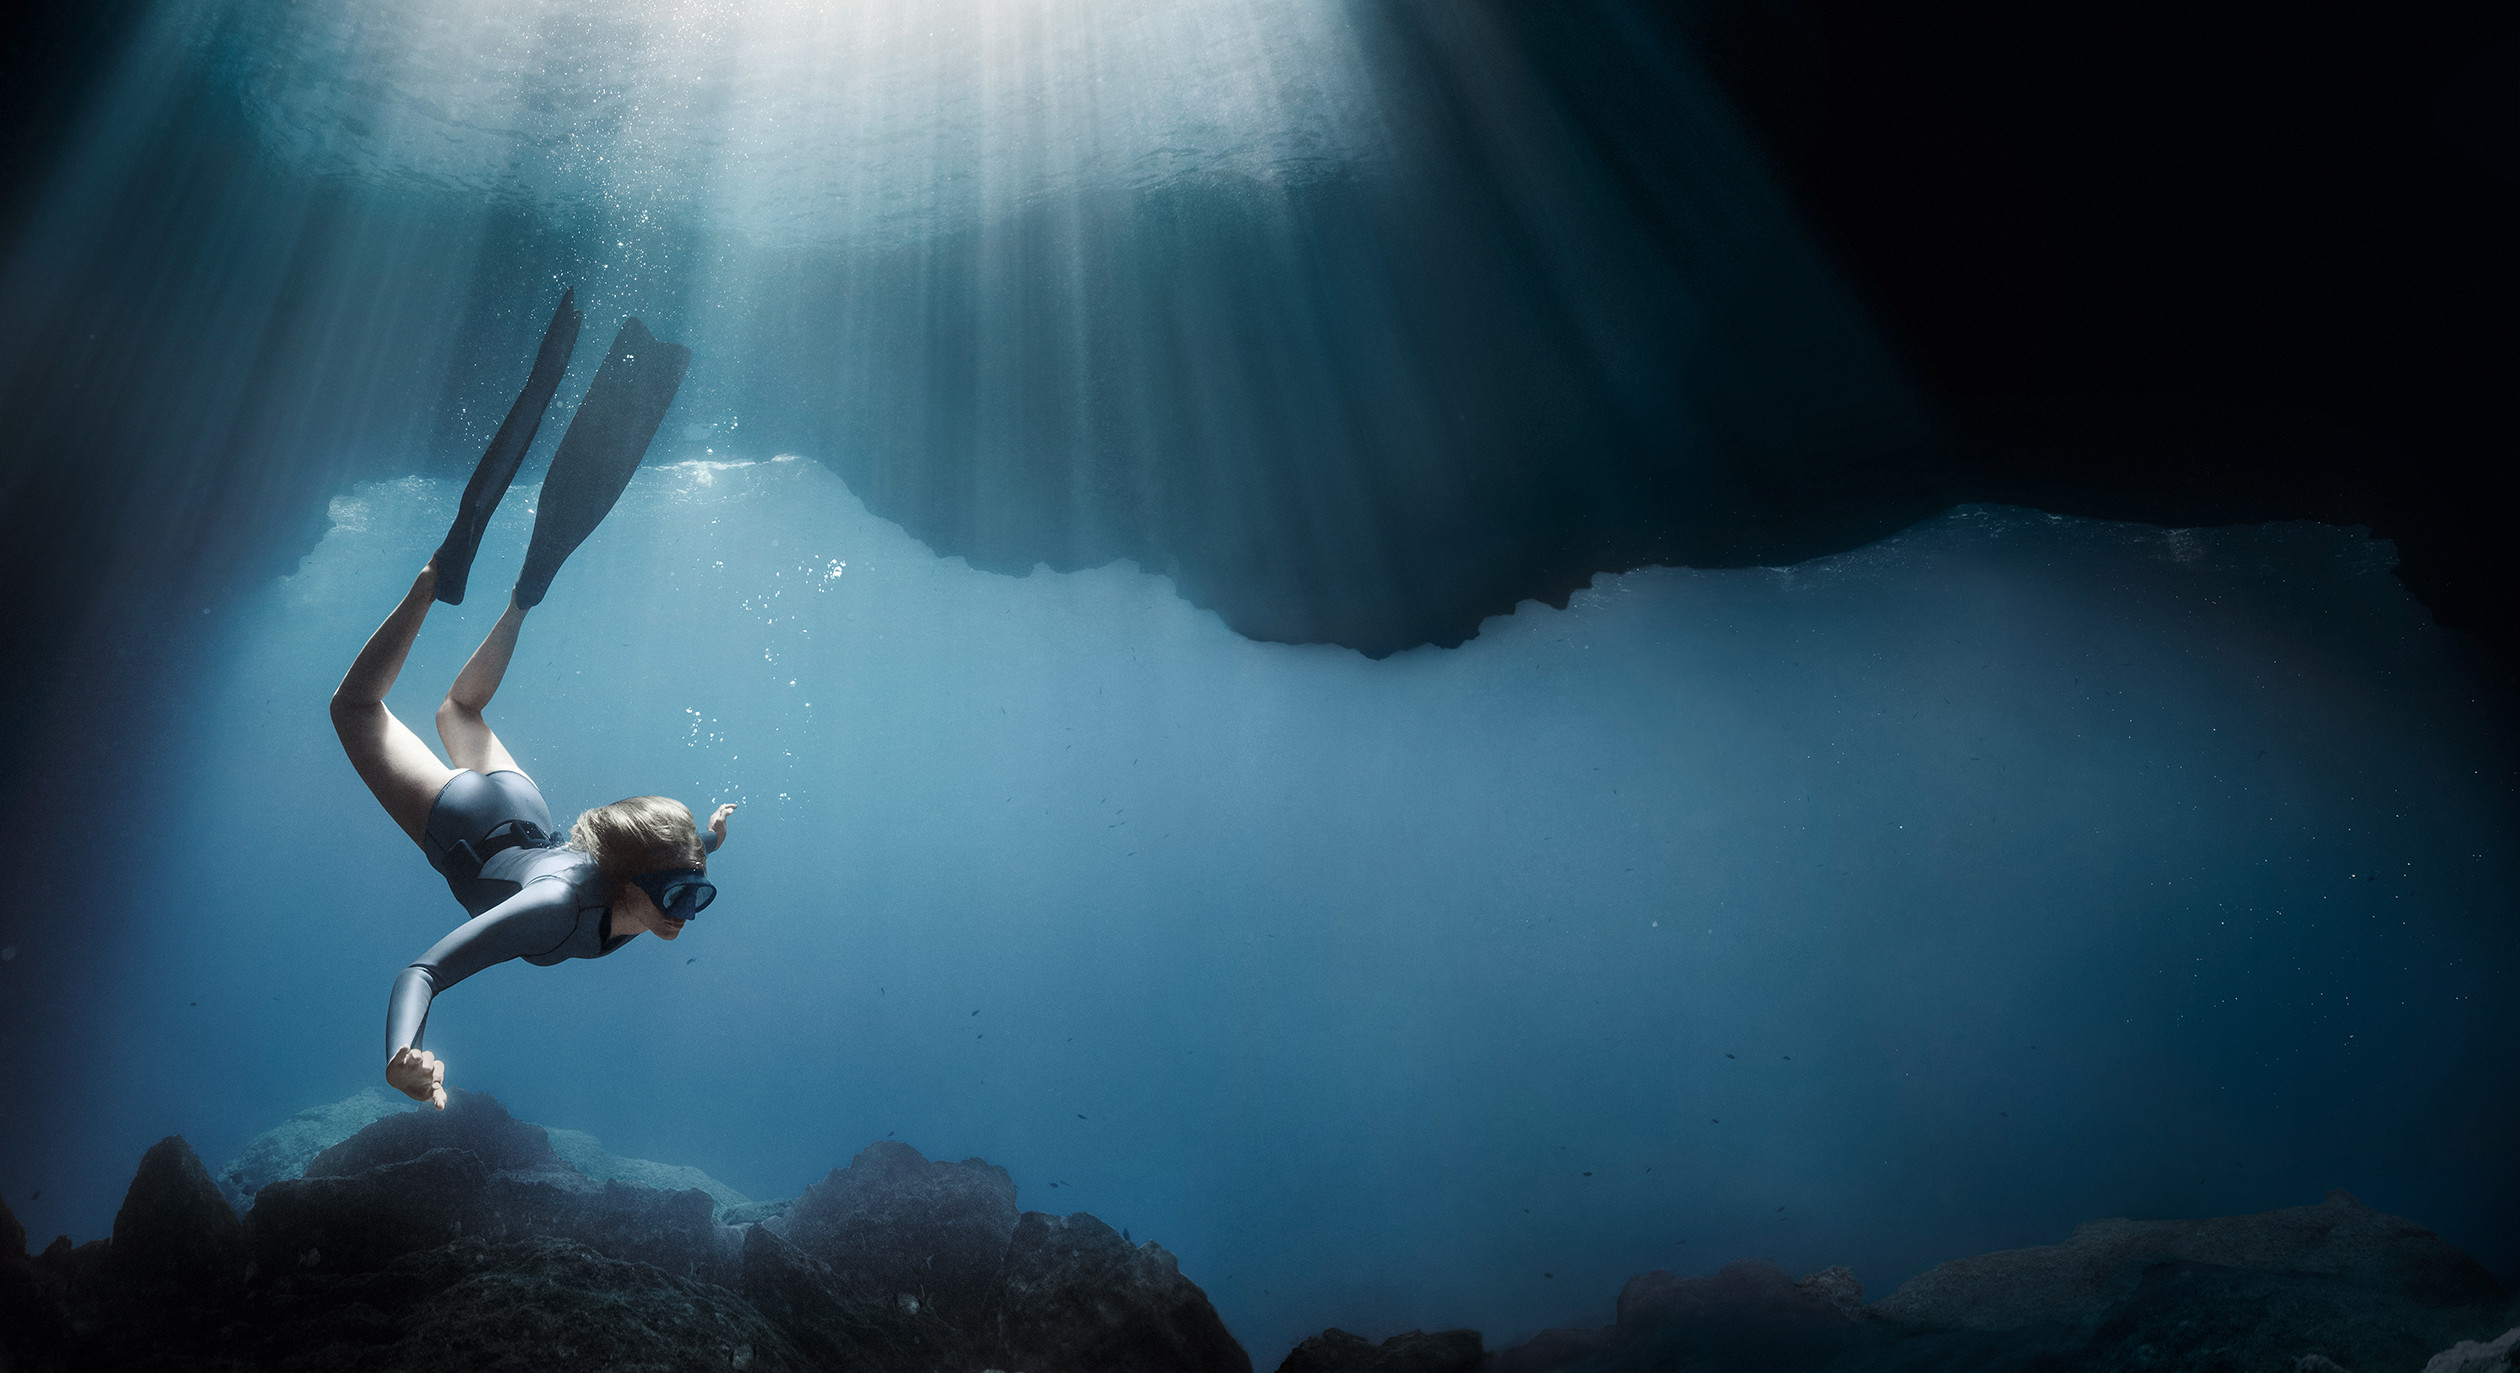 Miele_Stills_Diving_625_07_final_ISOcoatedv2